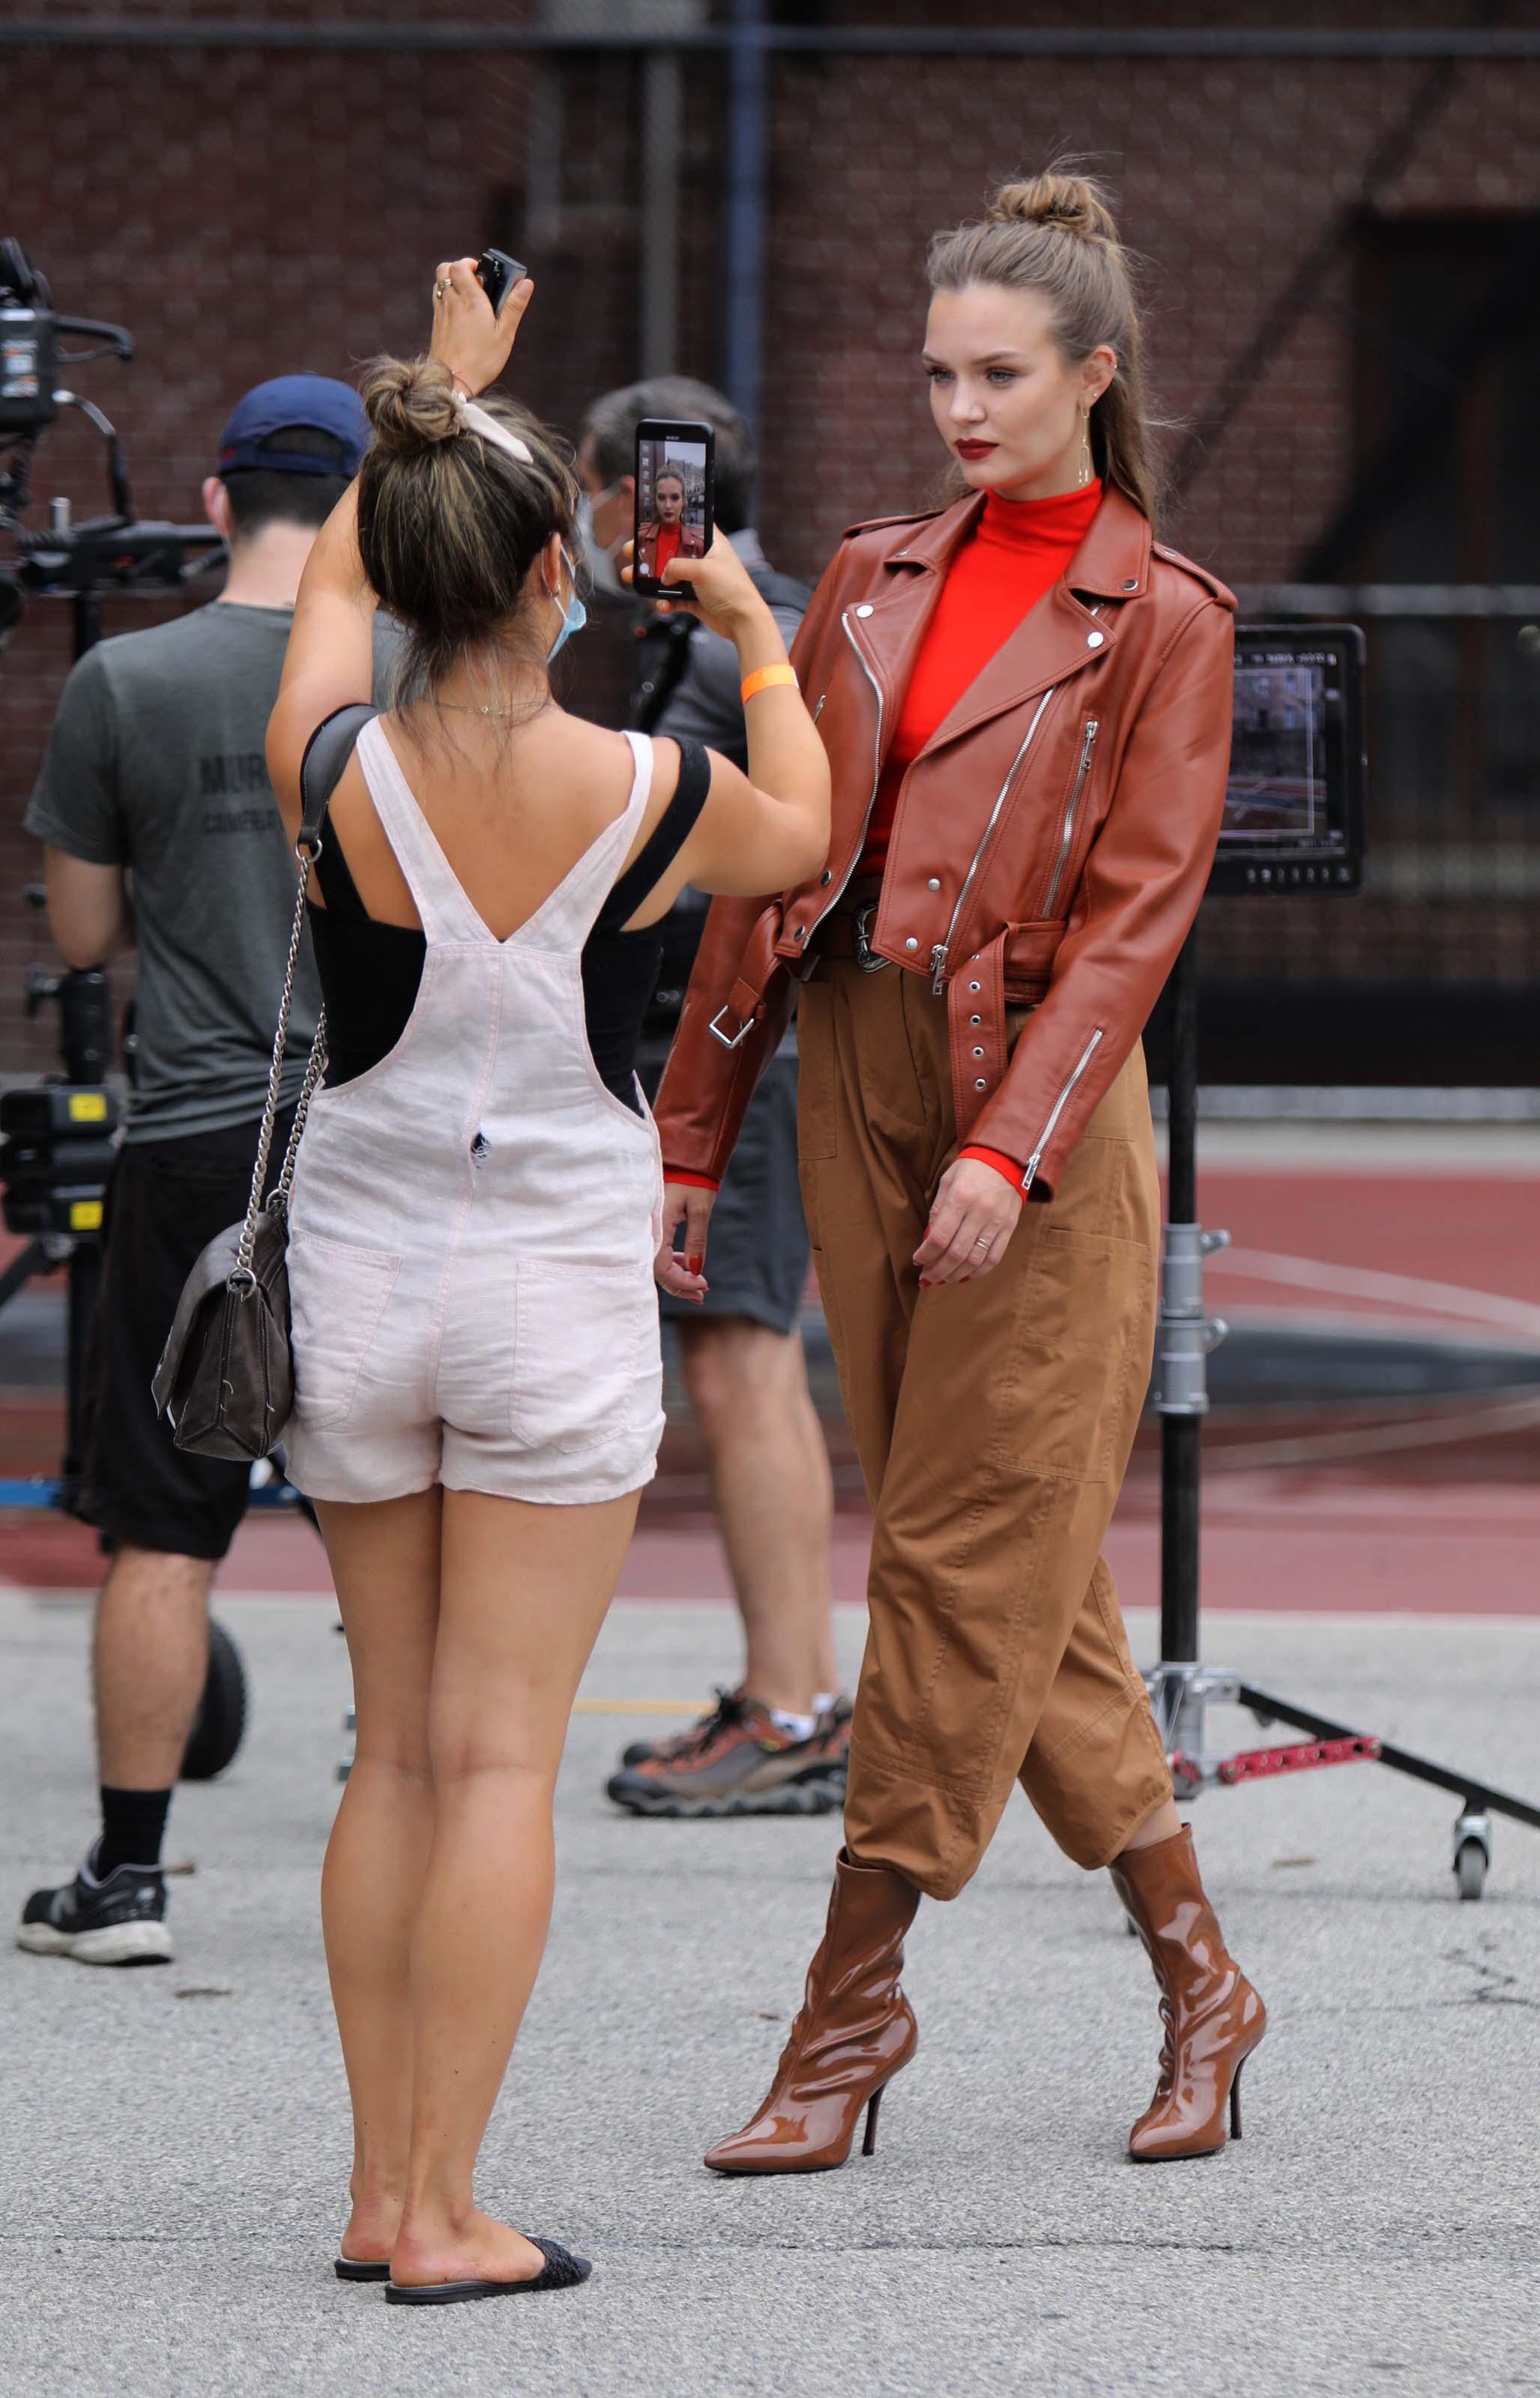 Josephine Skriver doing a Maybelline photoshoot